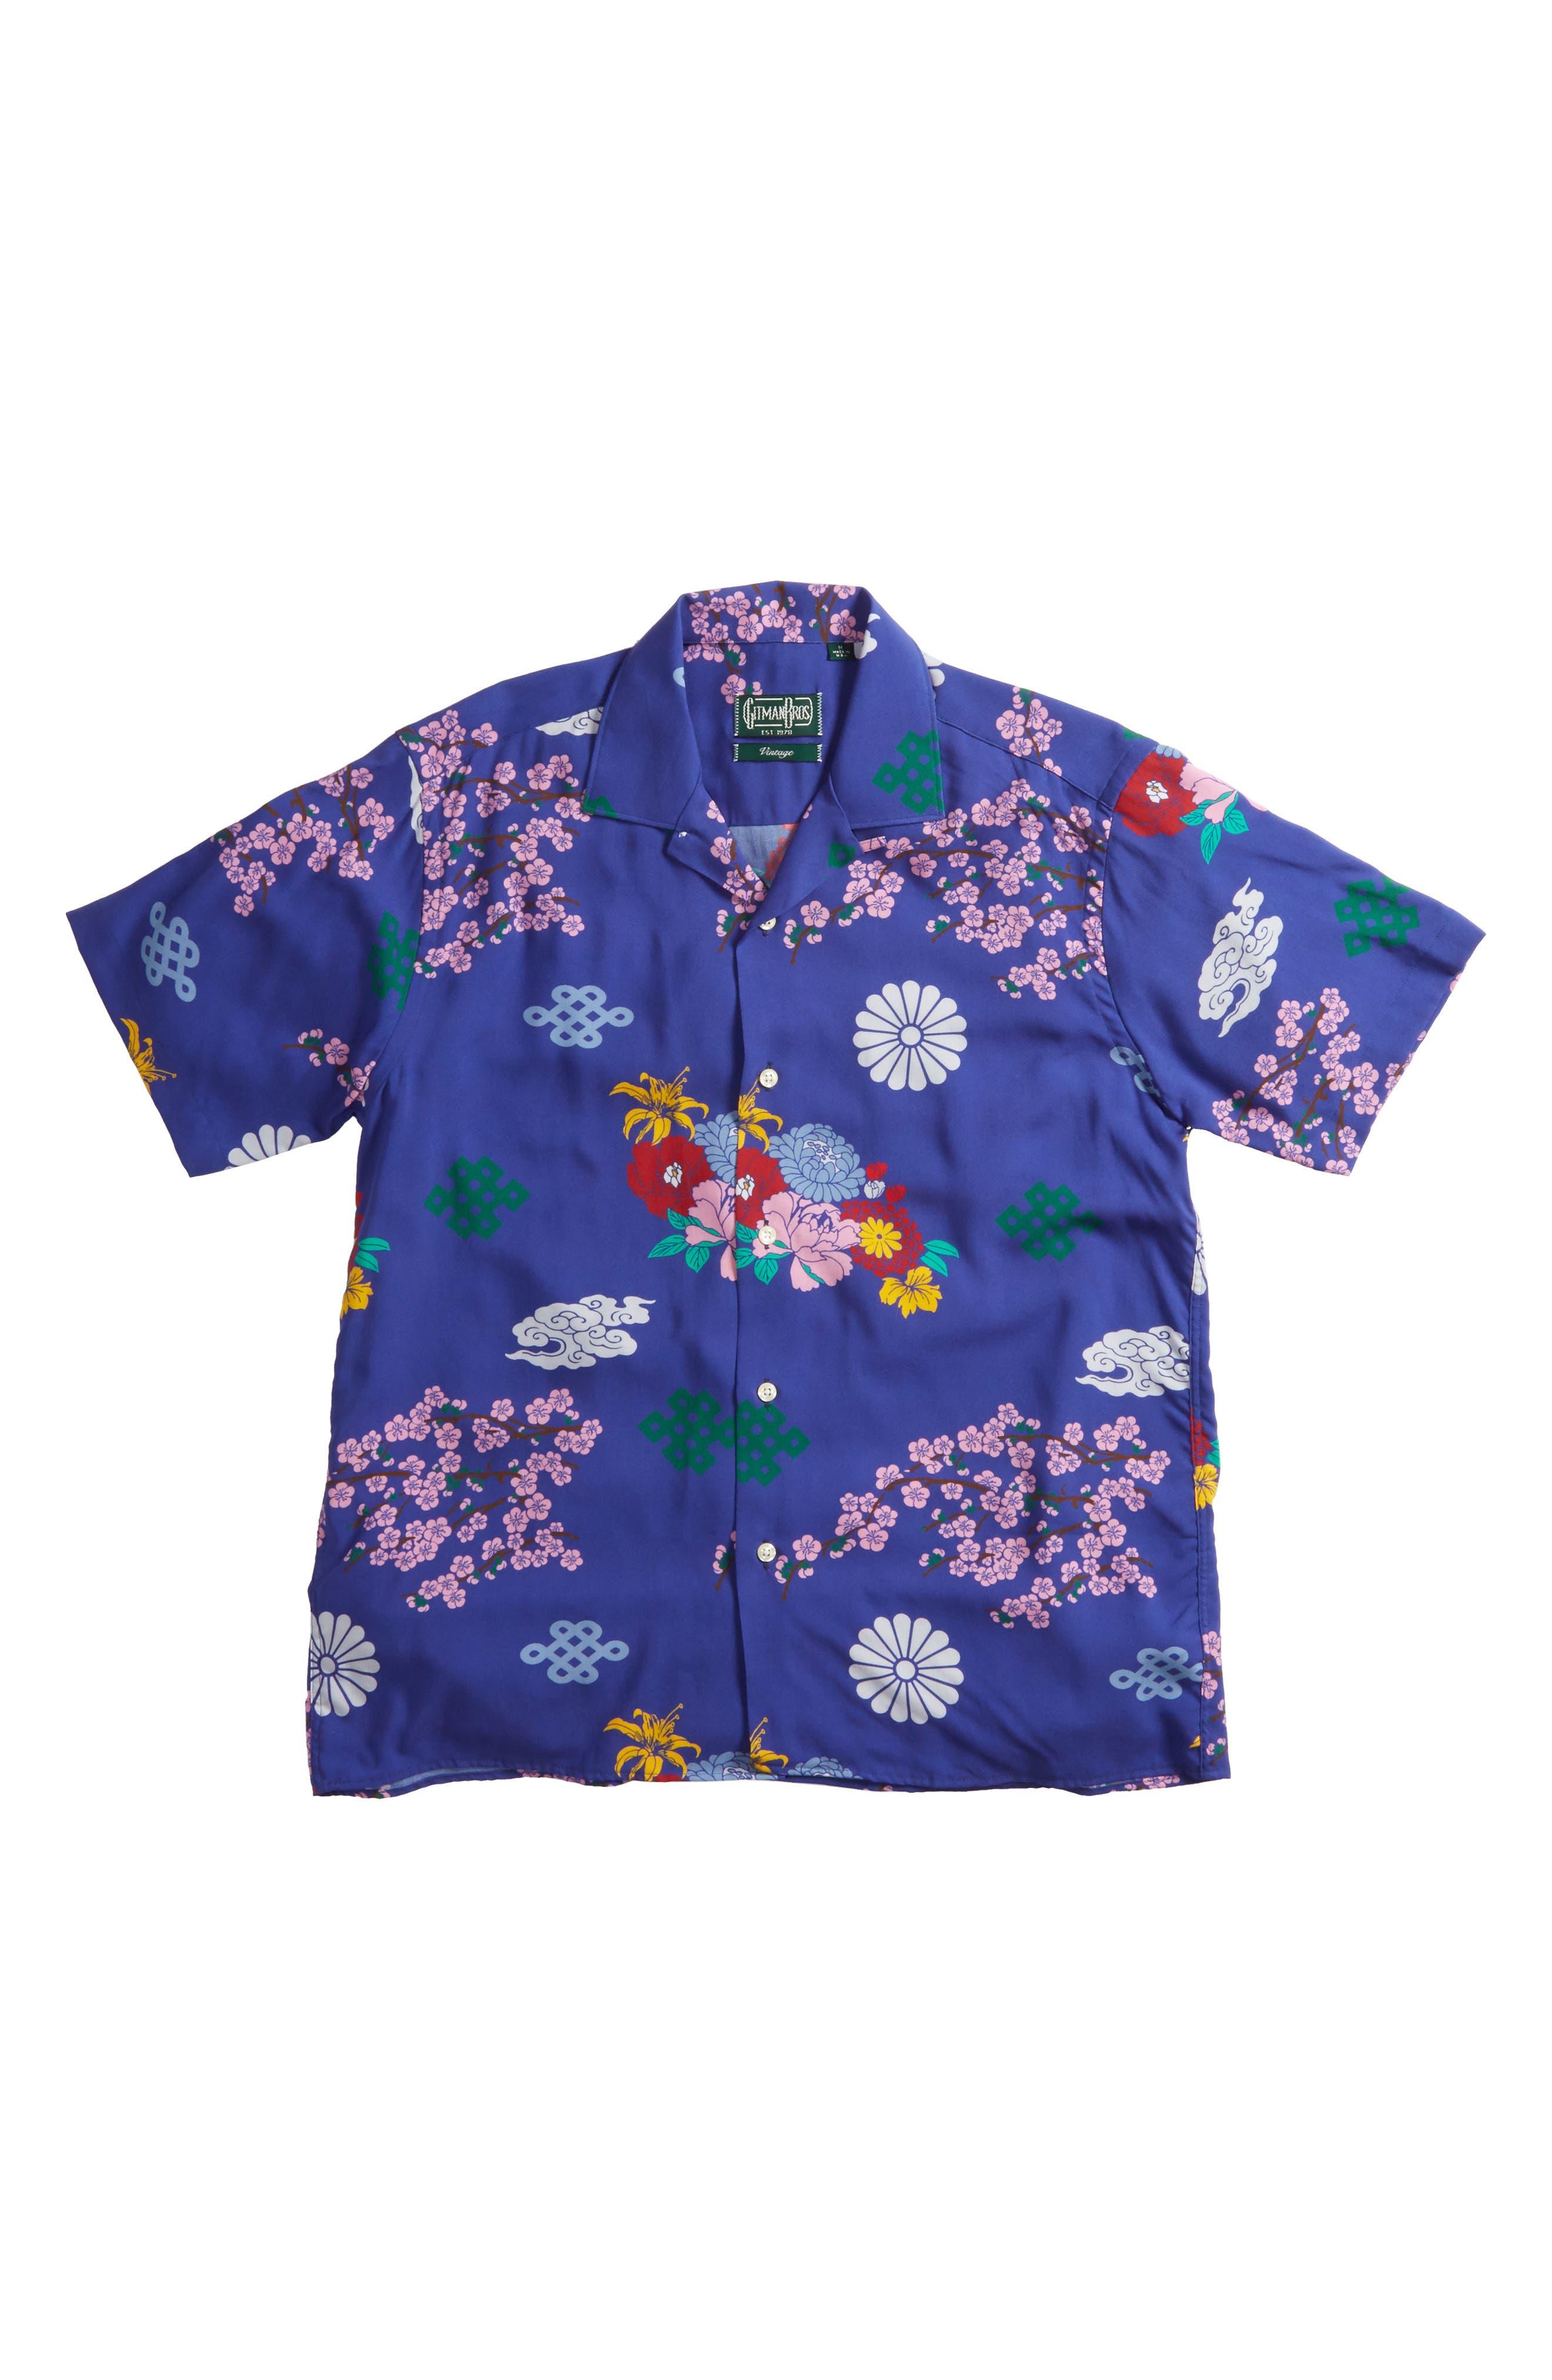 x The North Face Men's Floral Print Camp Shirt,                             Main thumbnail 1, color,                             400